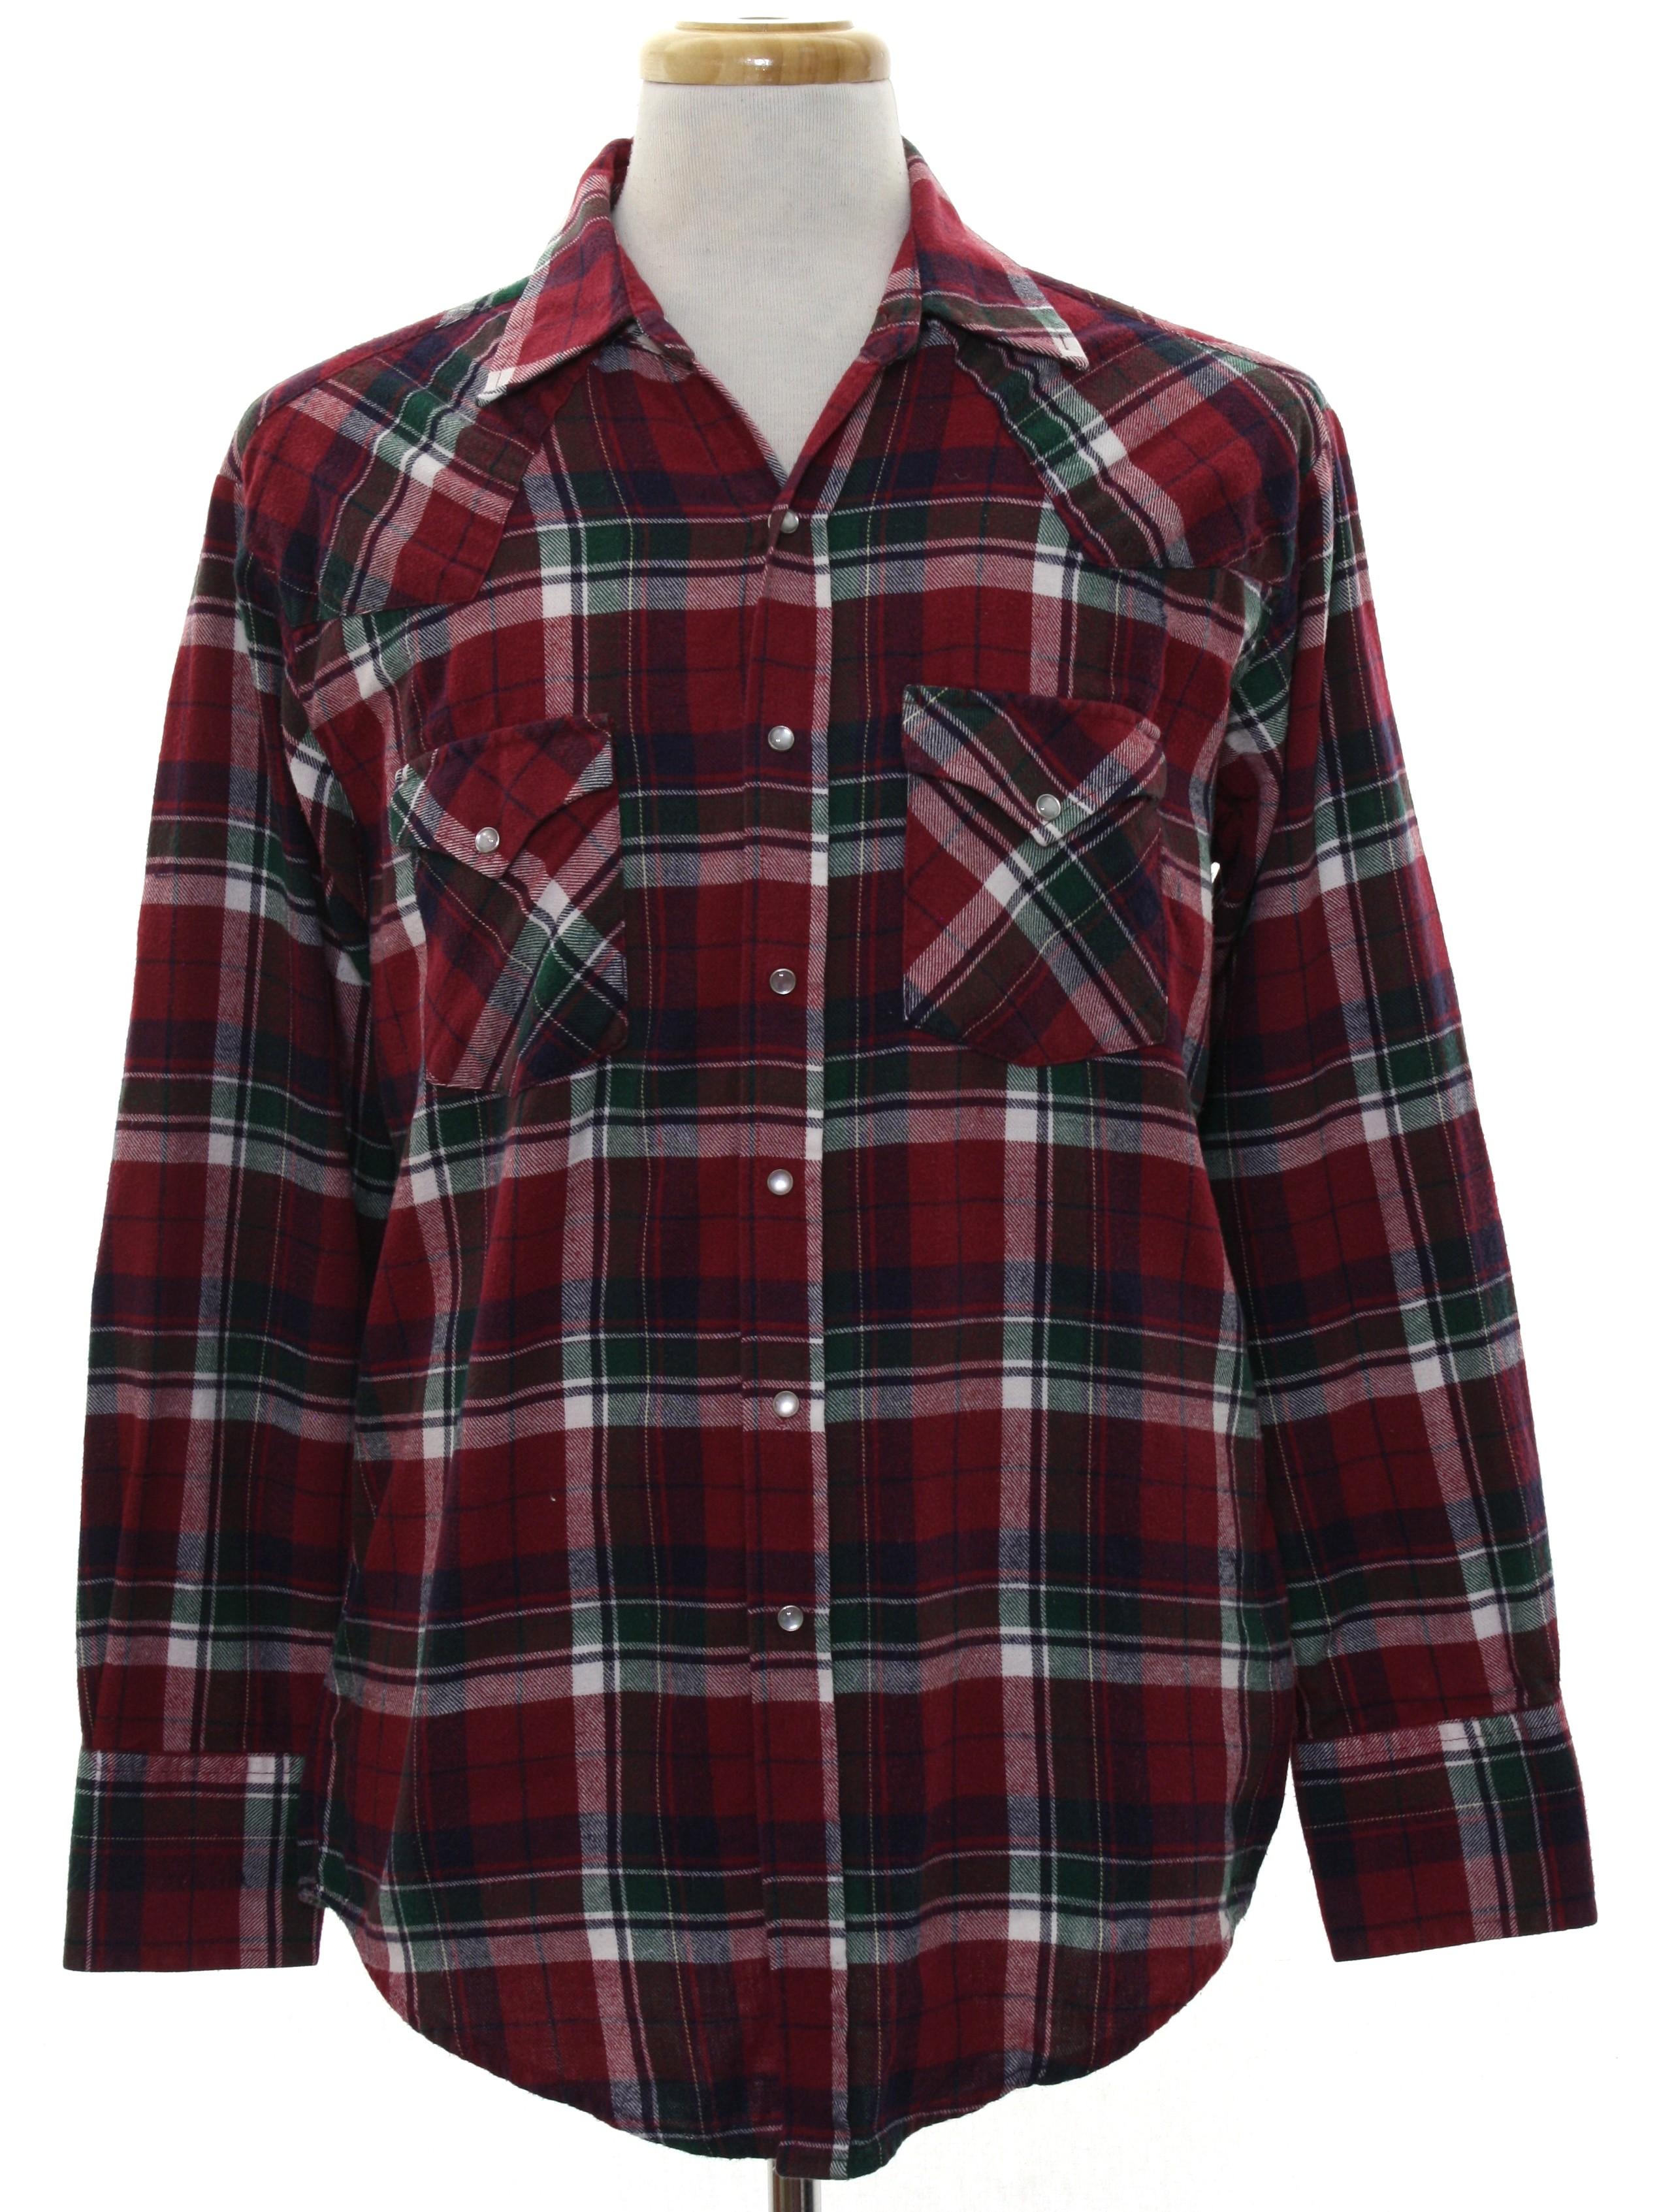 149c7726522971 80s Vintage Ely Cattleman Western Shirt  80s -Ely Cattleman- Mens ...